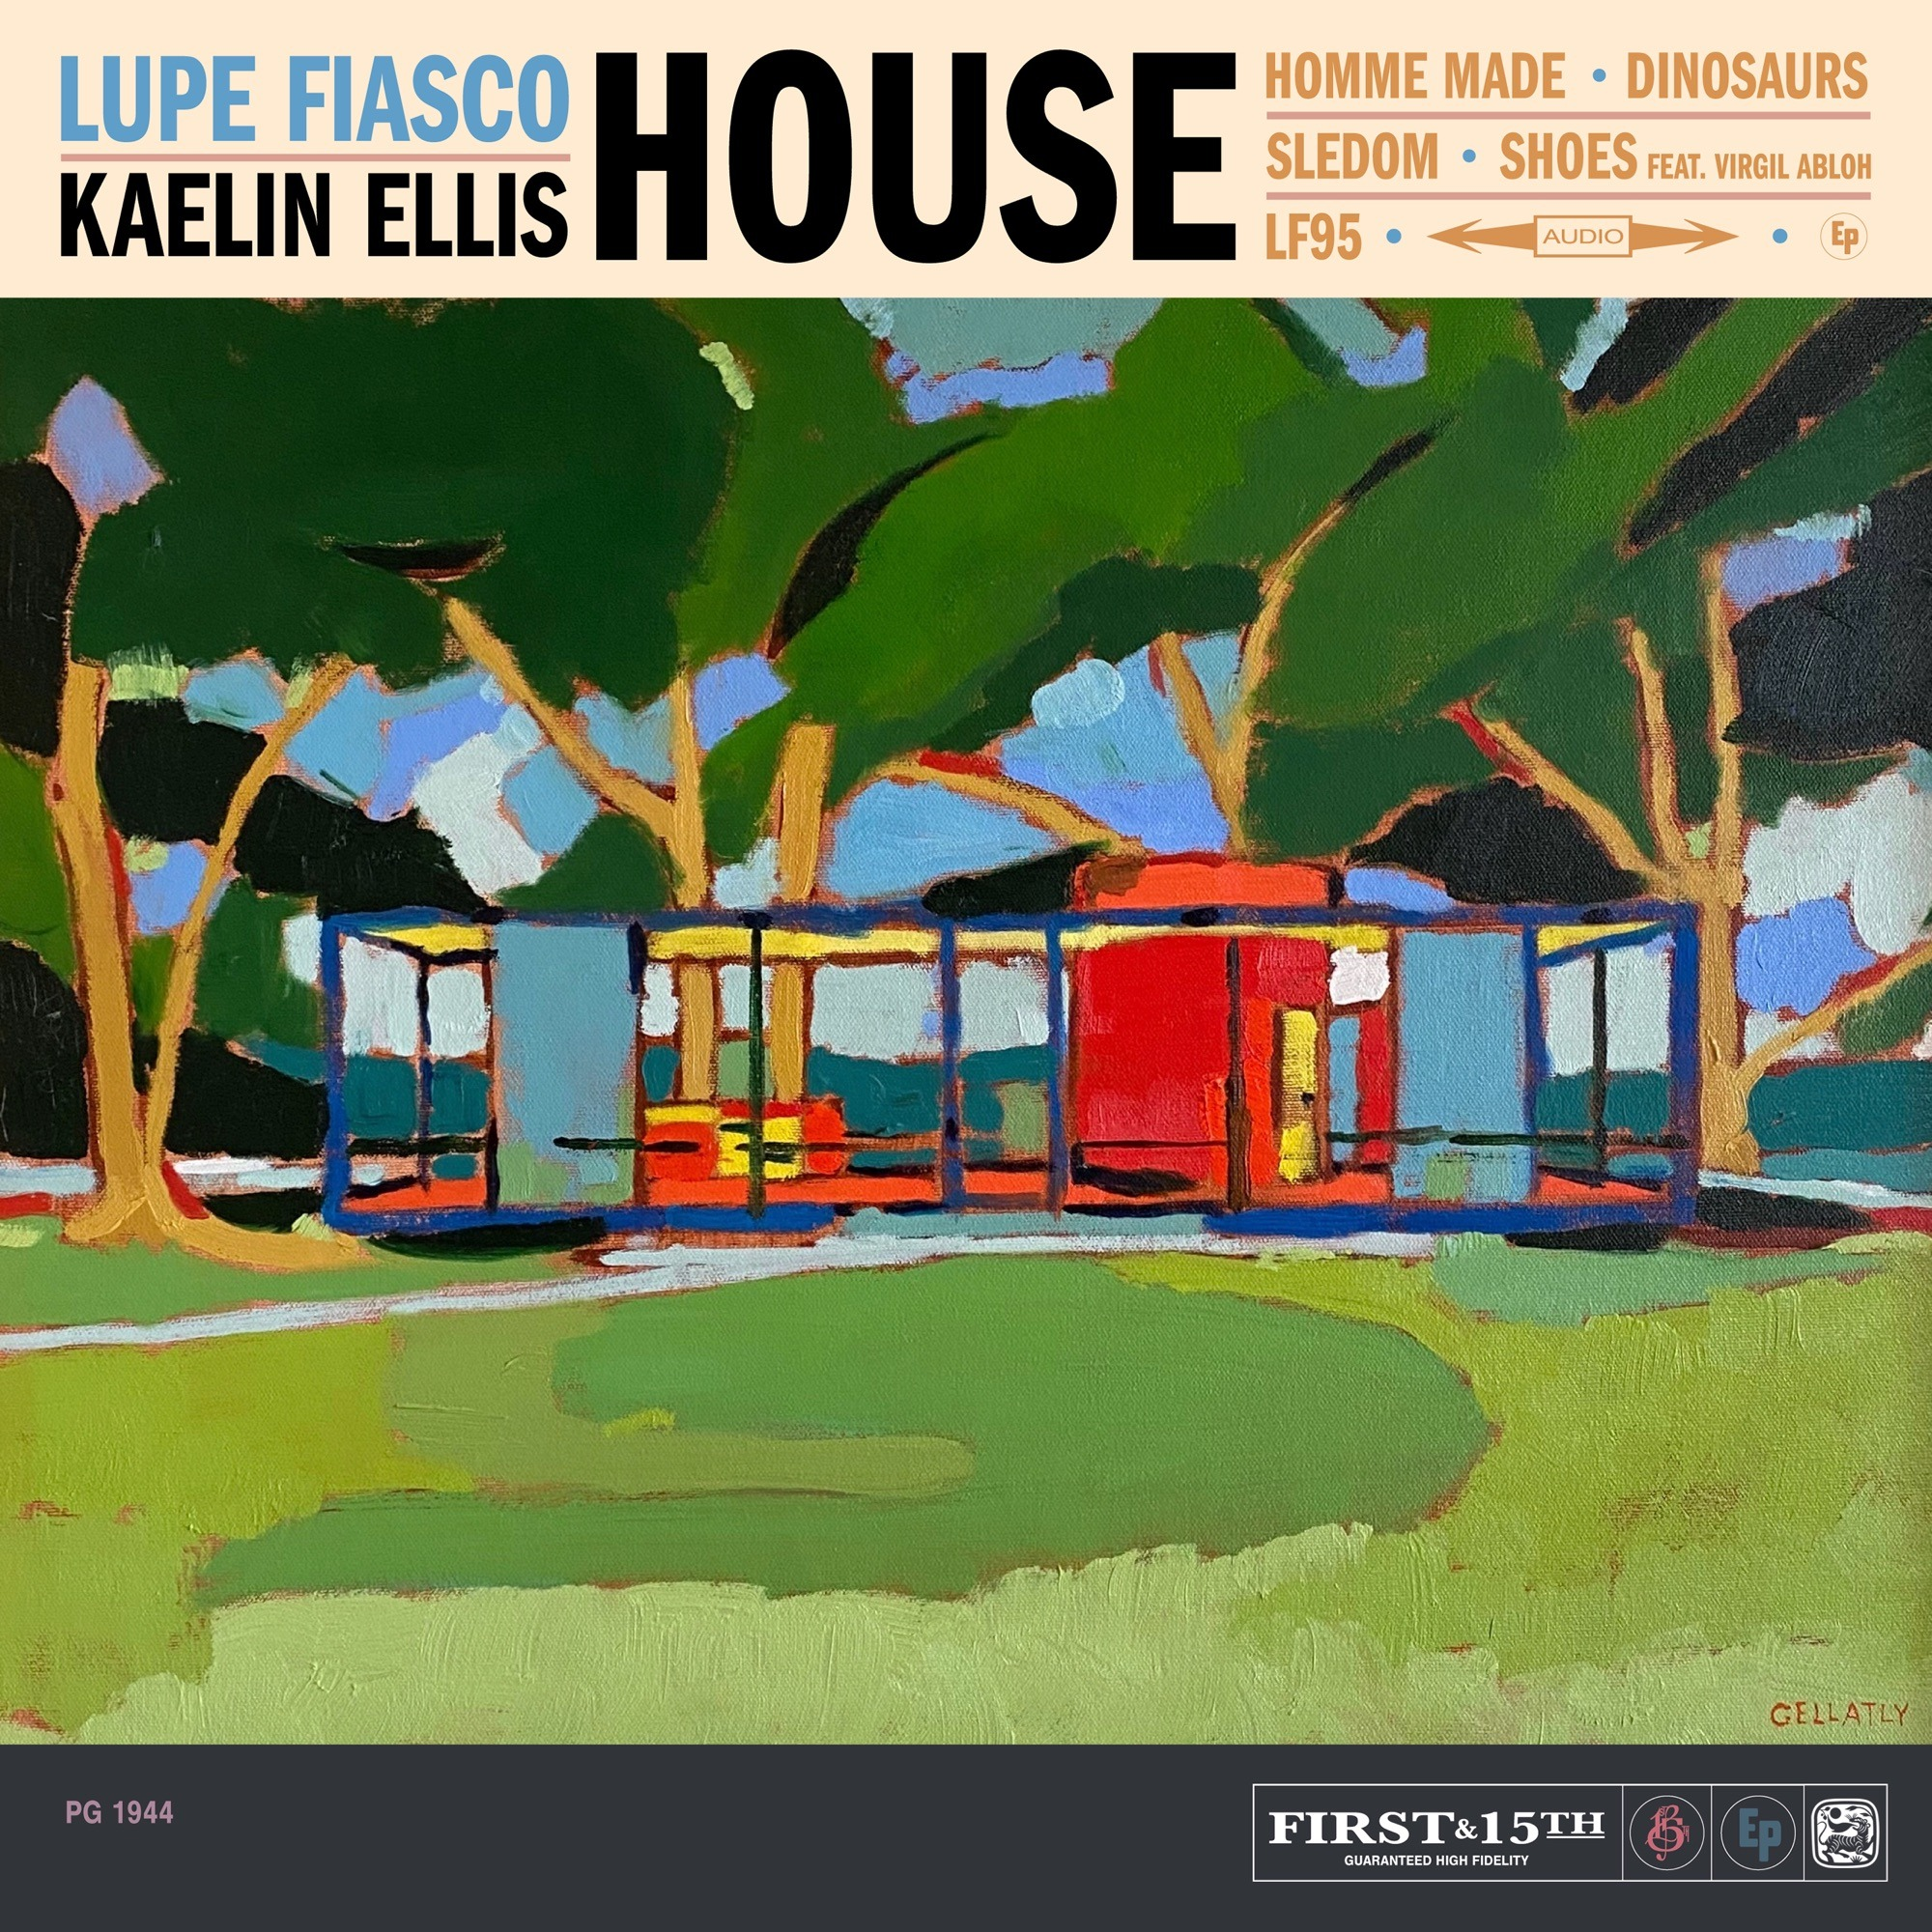 Lupe Fiasco & Kaelin Ellis – HOUSE (feat. Virgil Abloh)